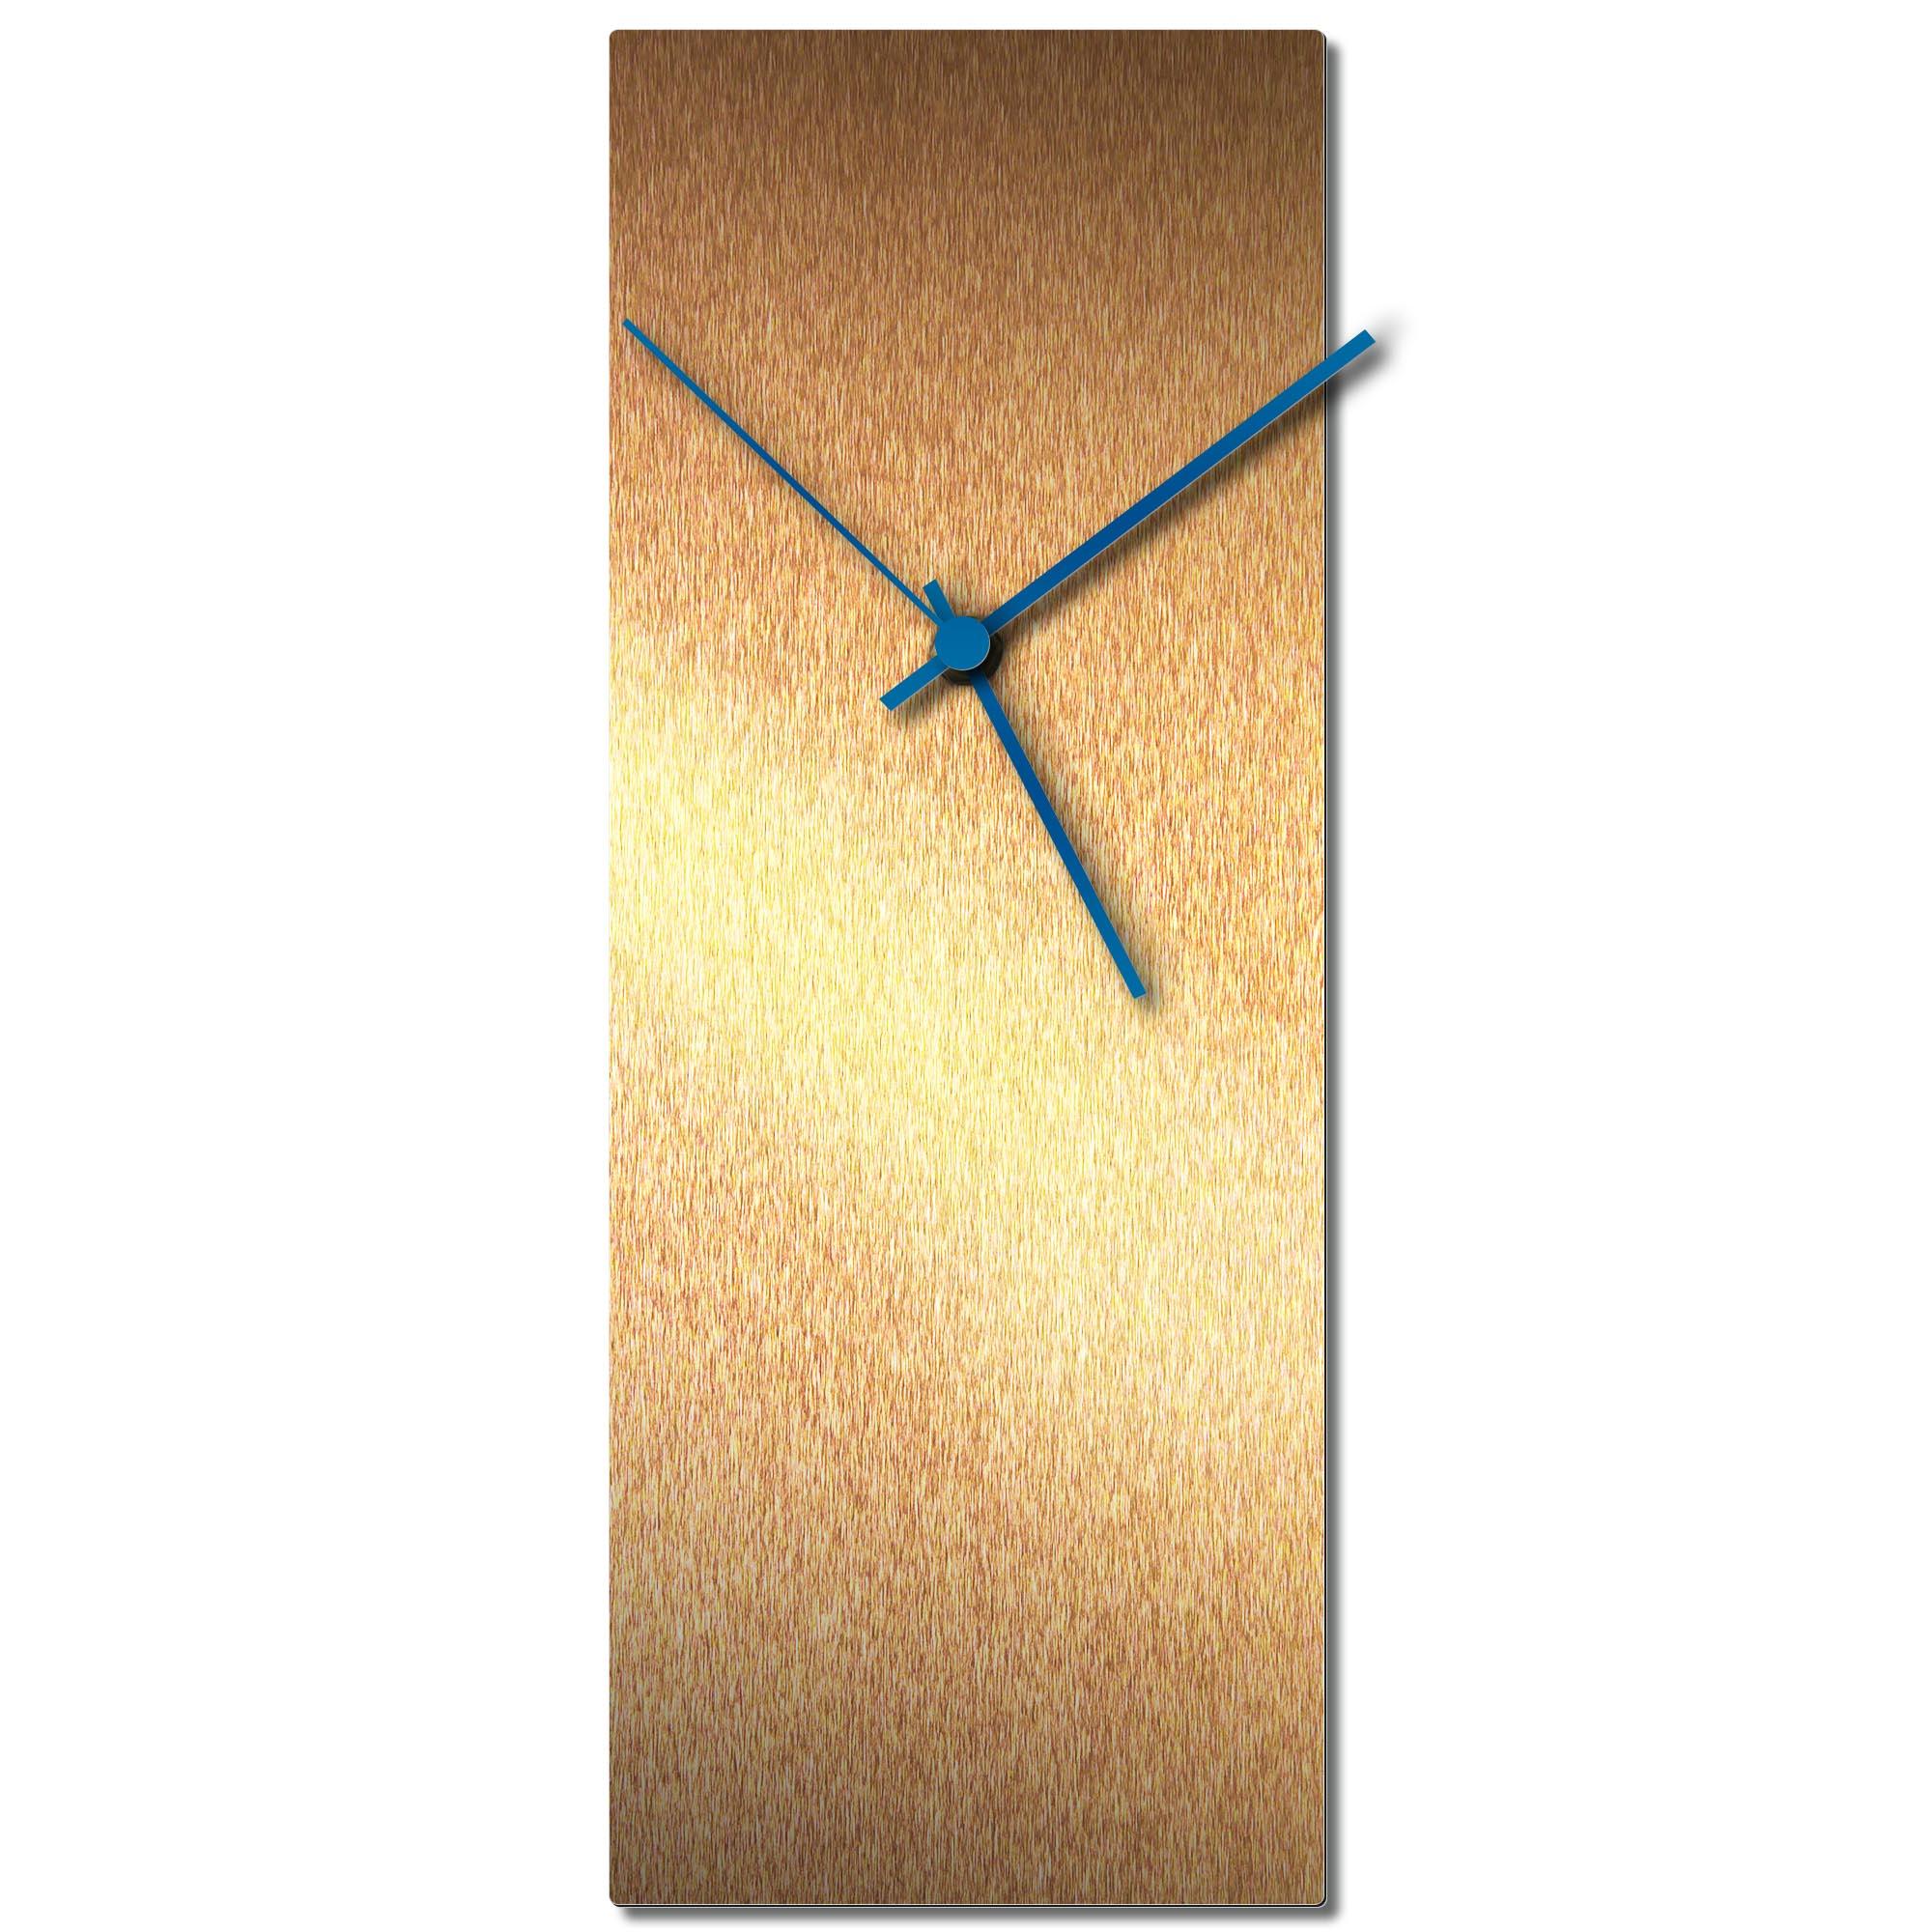 Adam Schwoeppe 'Bronzesmith Clock Large Blue' Midcentury Modern Style Wall Clock